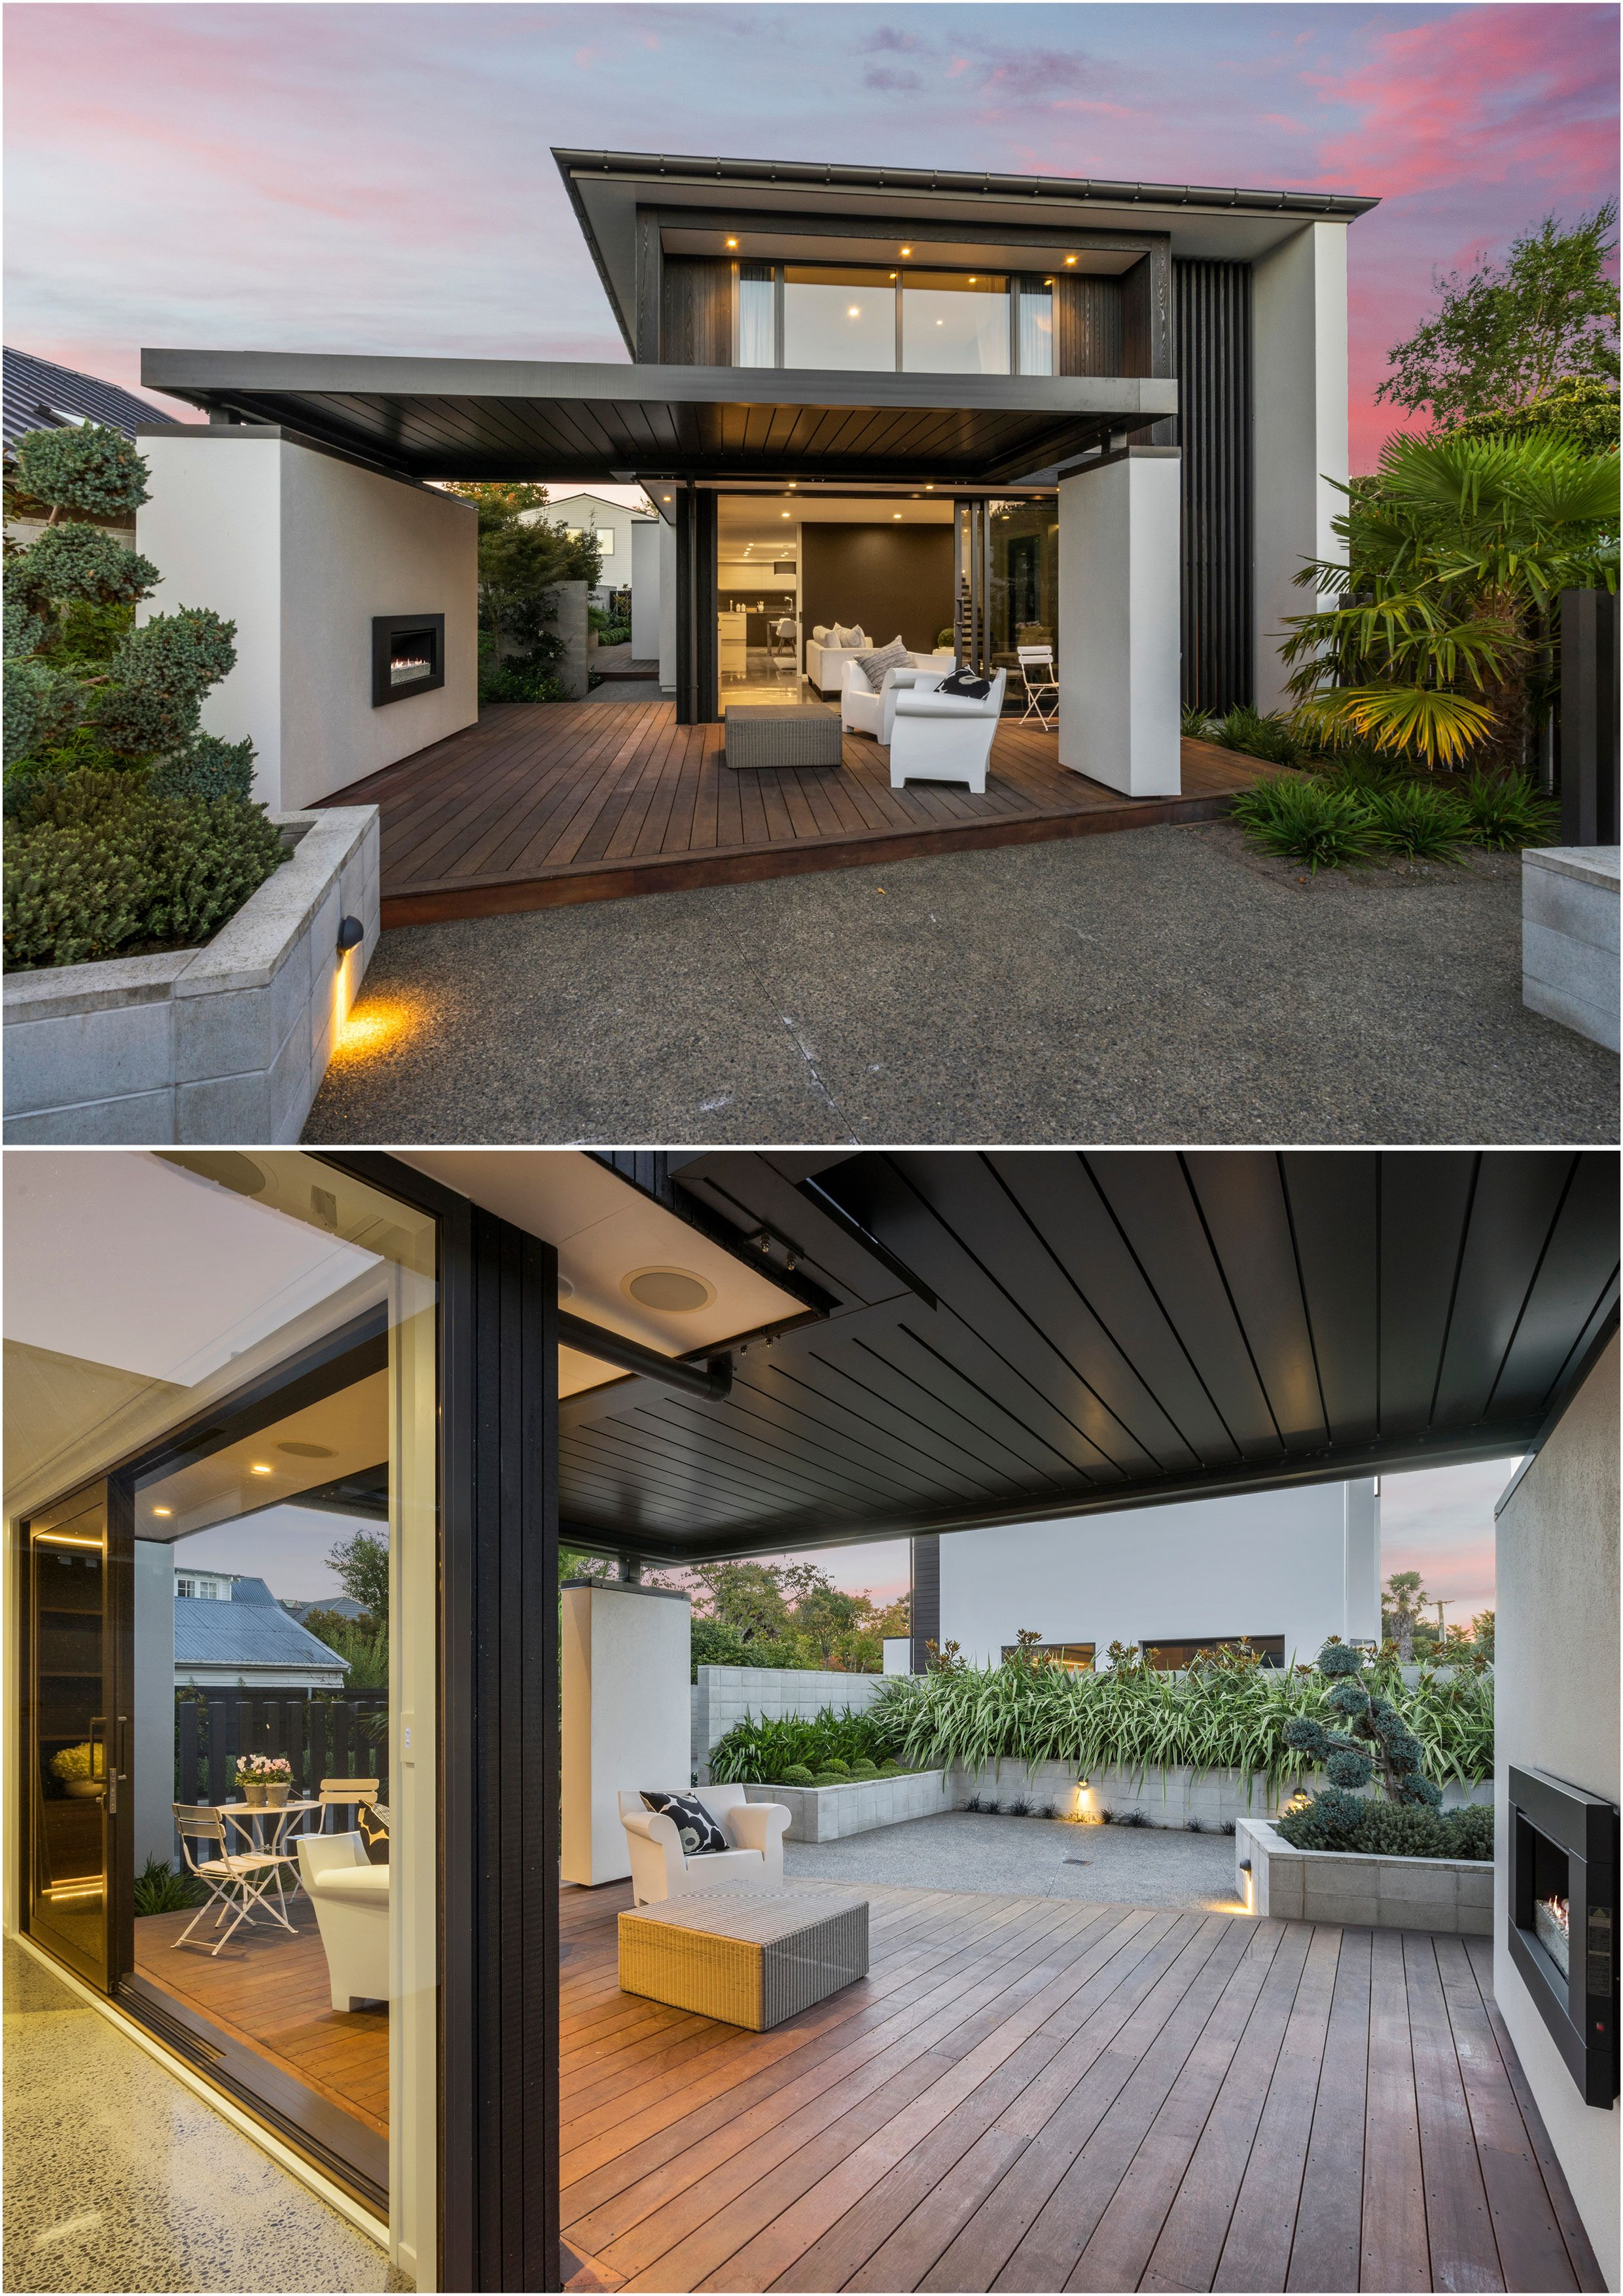 Masterpiece Patio Doors Reviews: Beautiful Outdoor Living